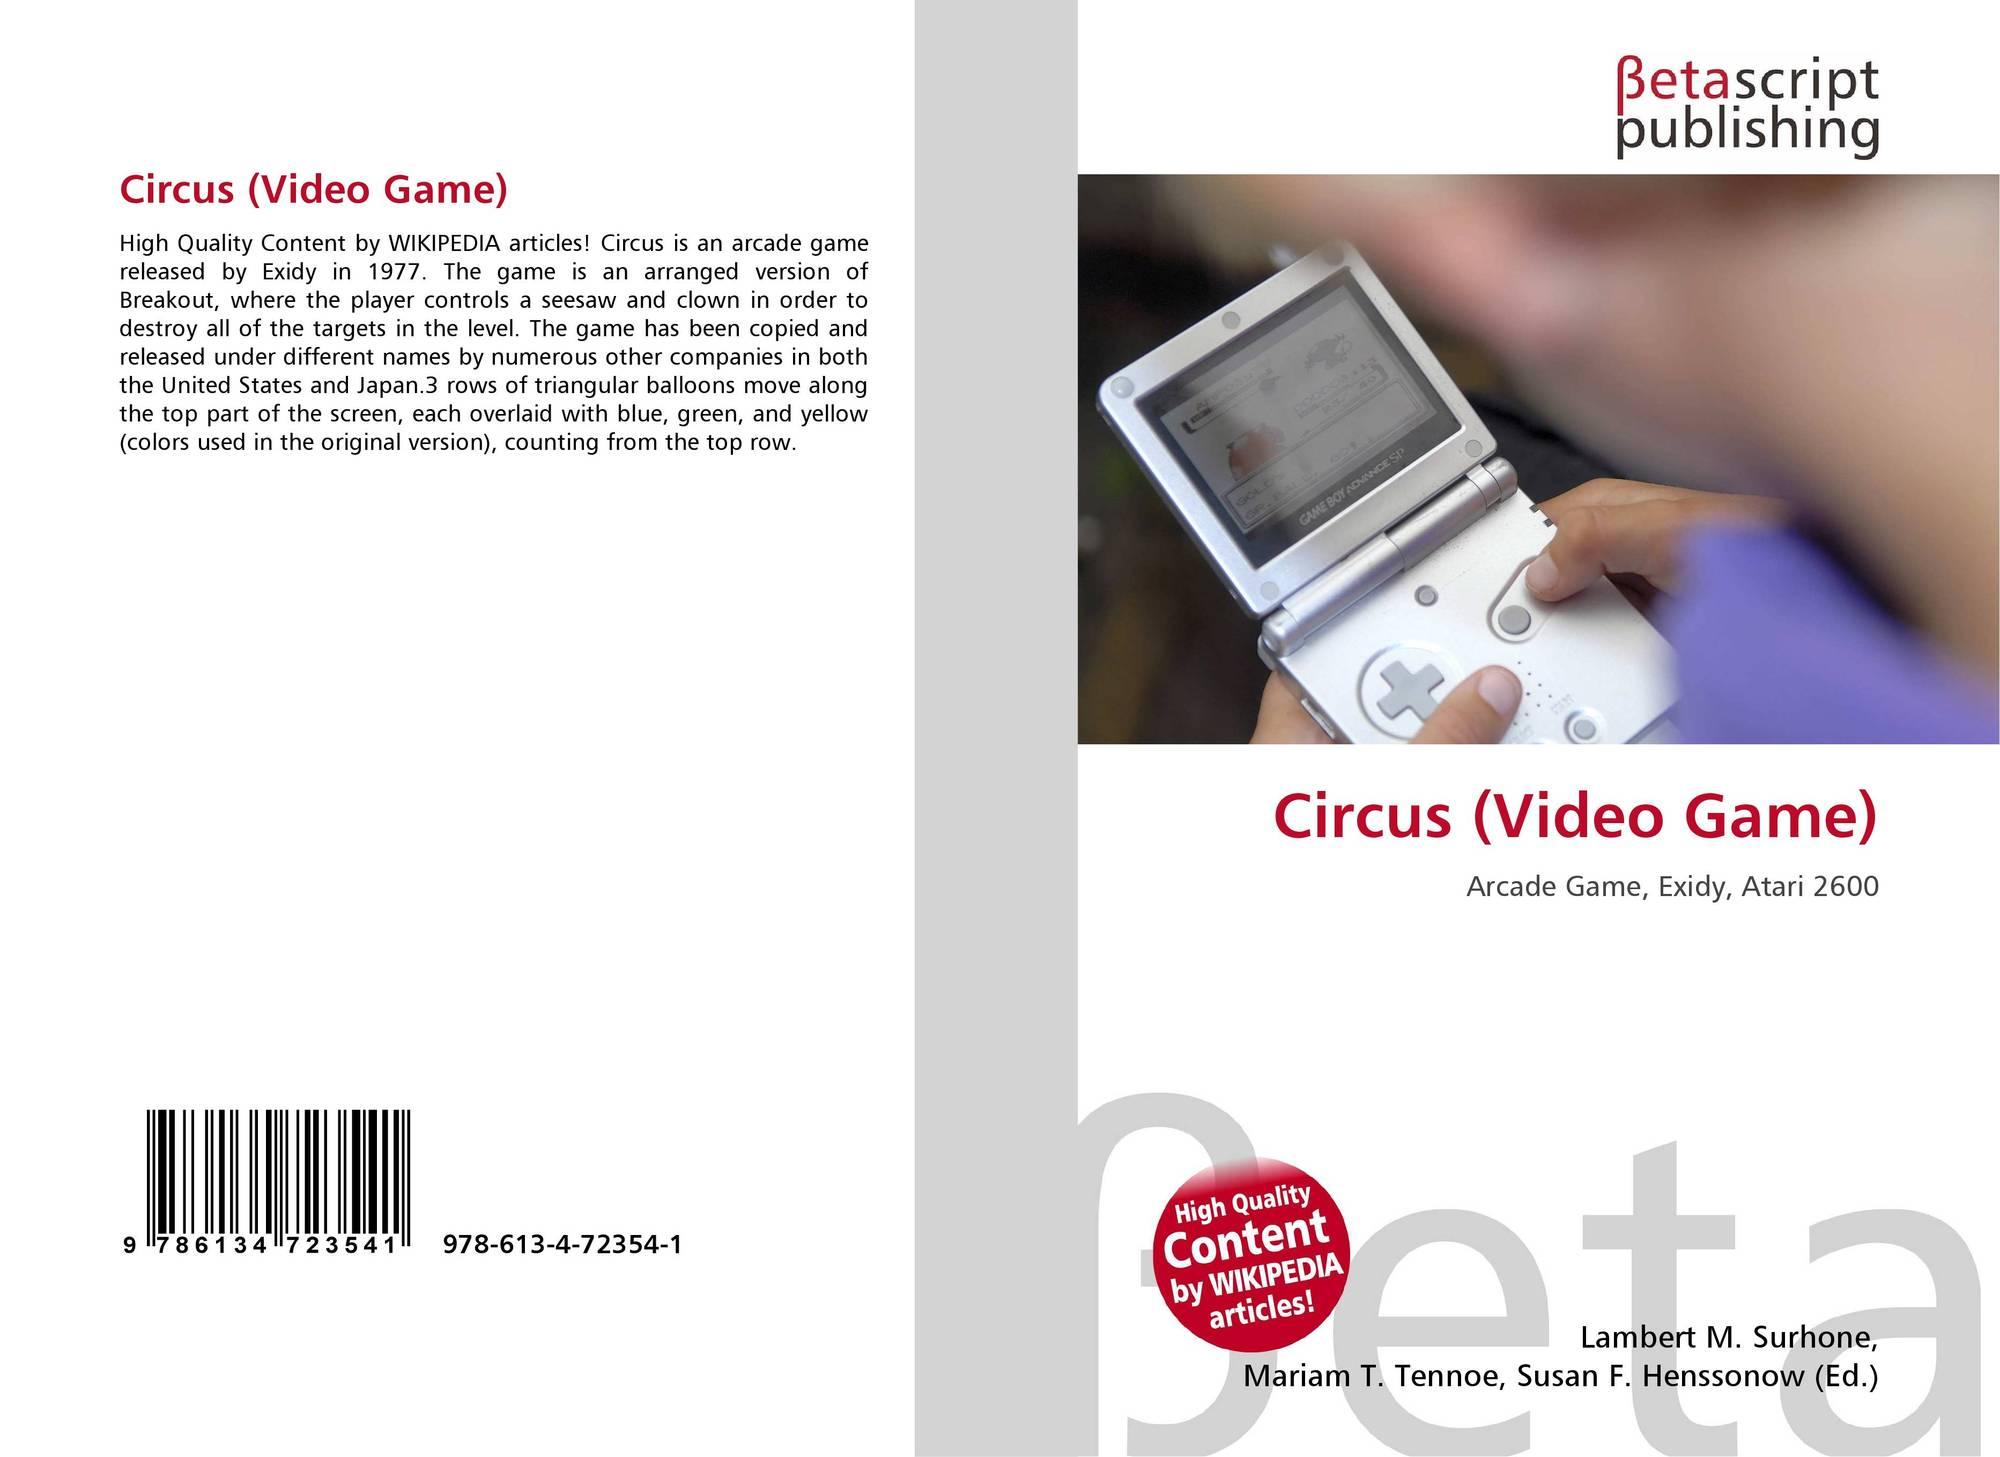 Circus Video Game 978 613 4 72354 1 6134723541 9786134723541